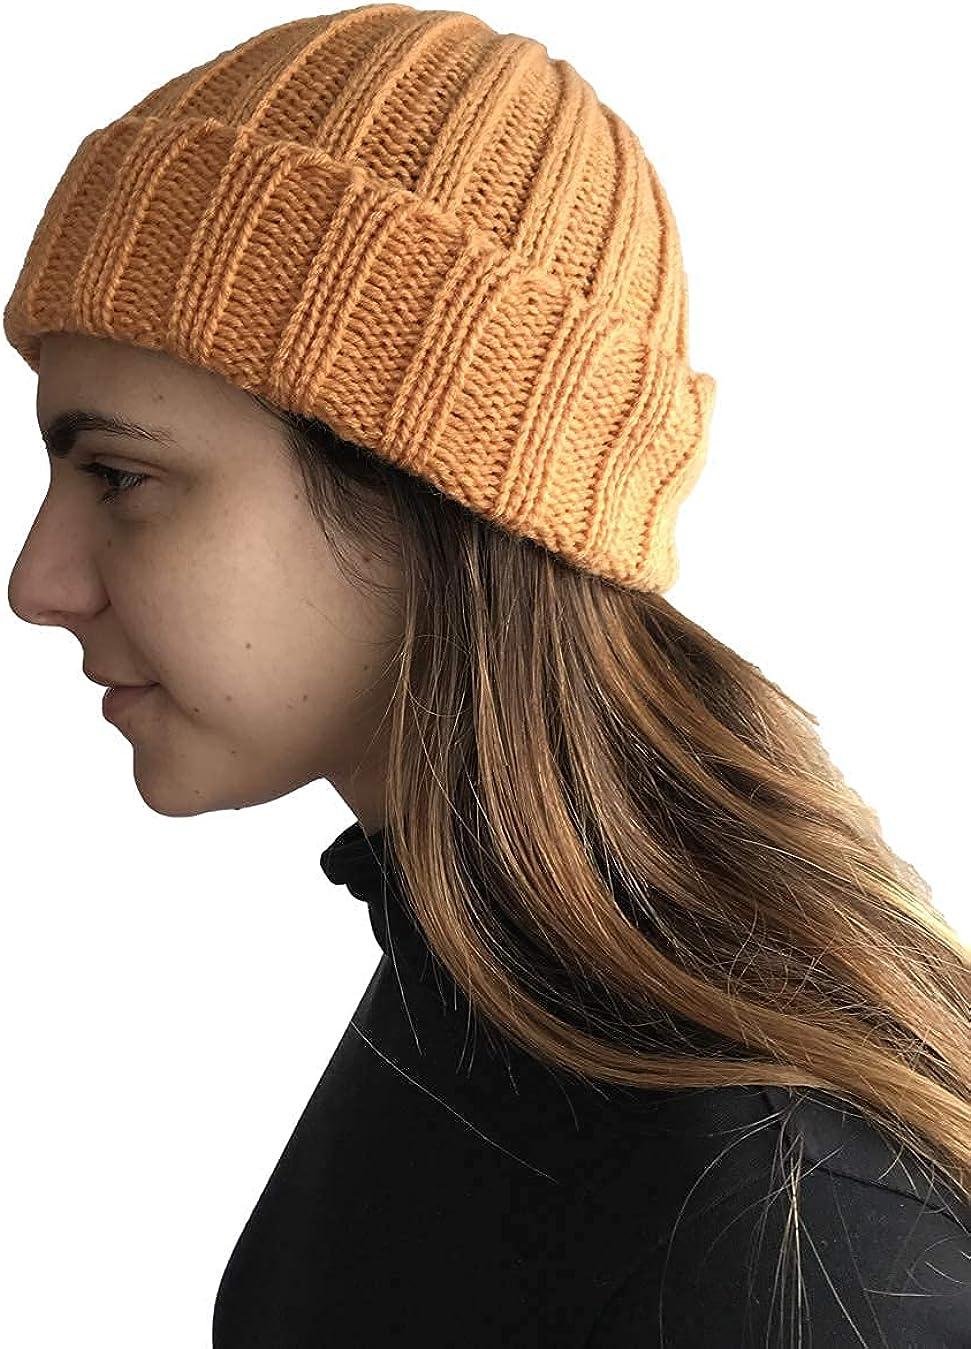 TINKUY PERU - Alpaca Wool Knit + Beanie 5 ☆ popular Hat Cap Mittens Skull Deluxe